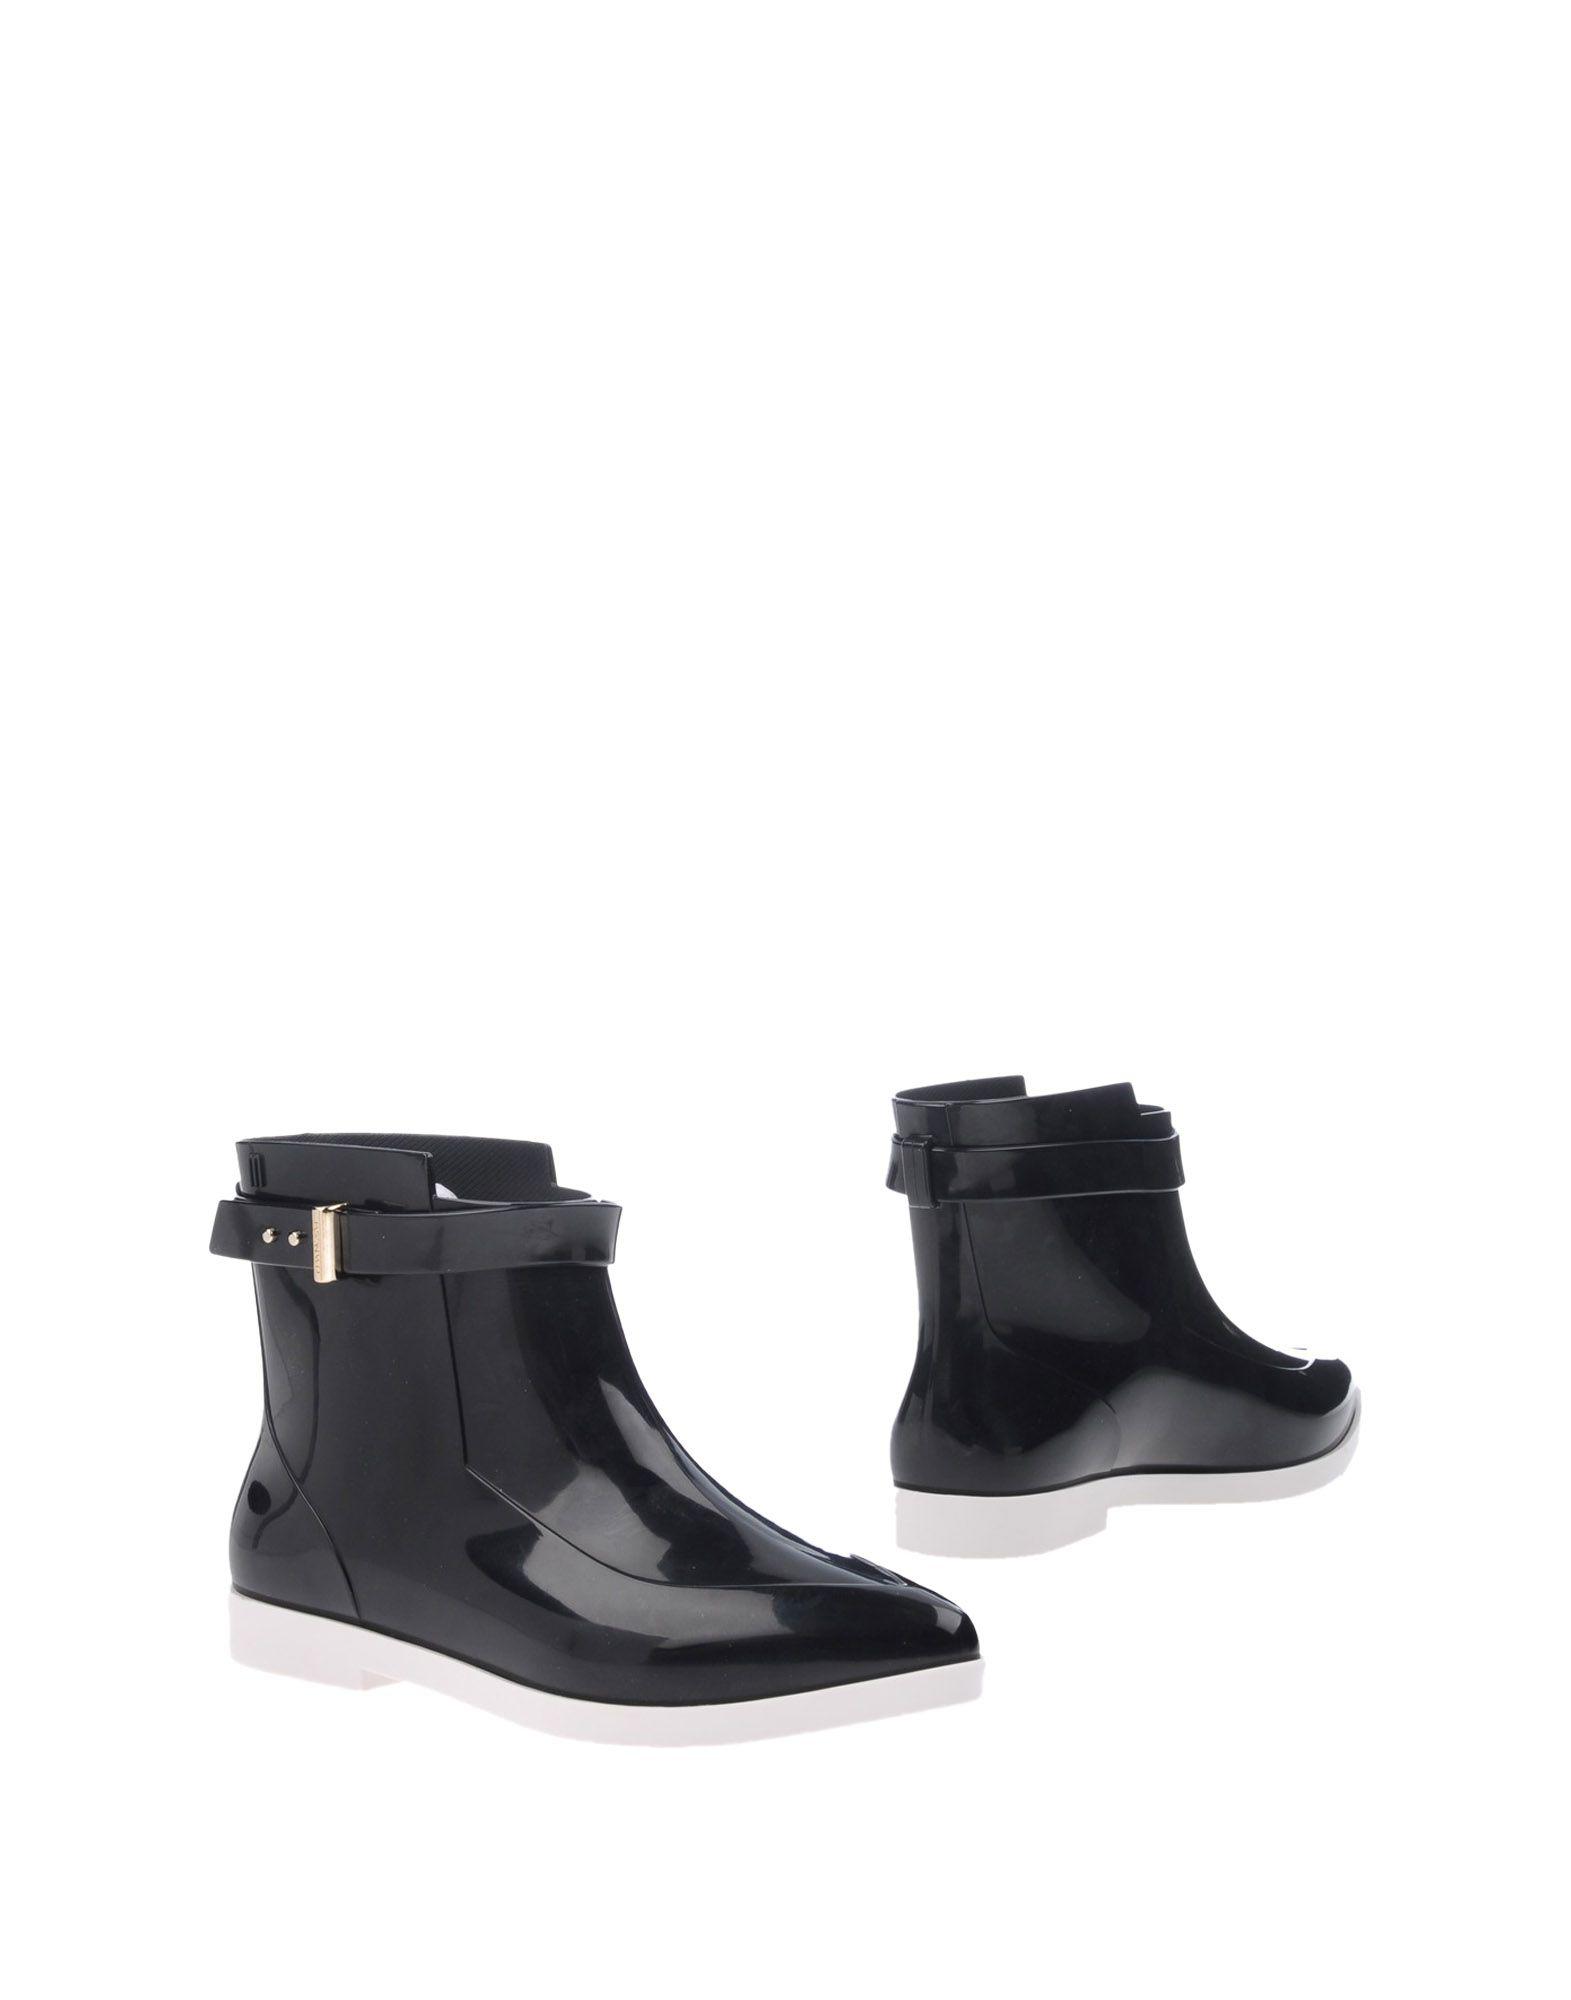 MELISSA + JASON WU Полусапоги и высокие ботинки 500g he shou wu powder black been polygonum multiflorum root 100